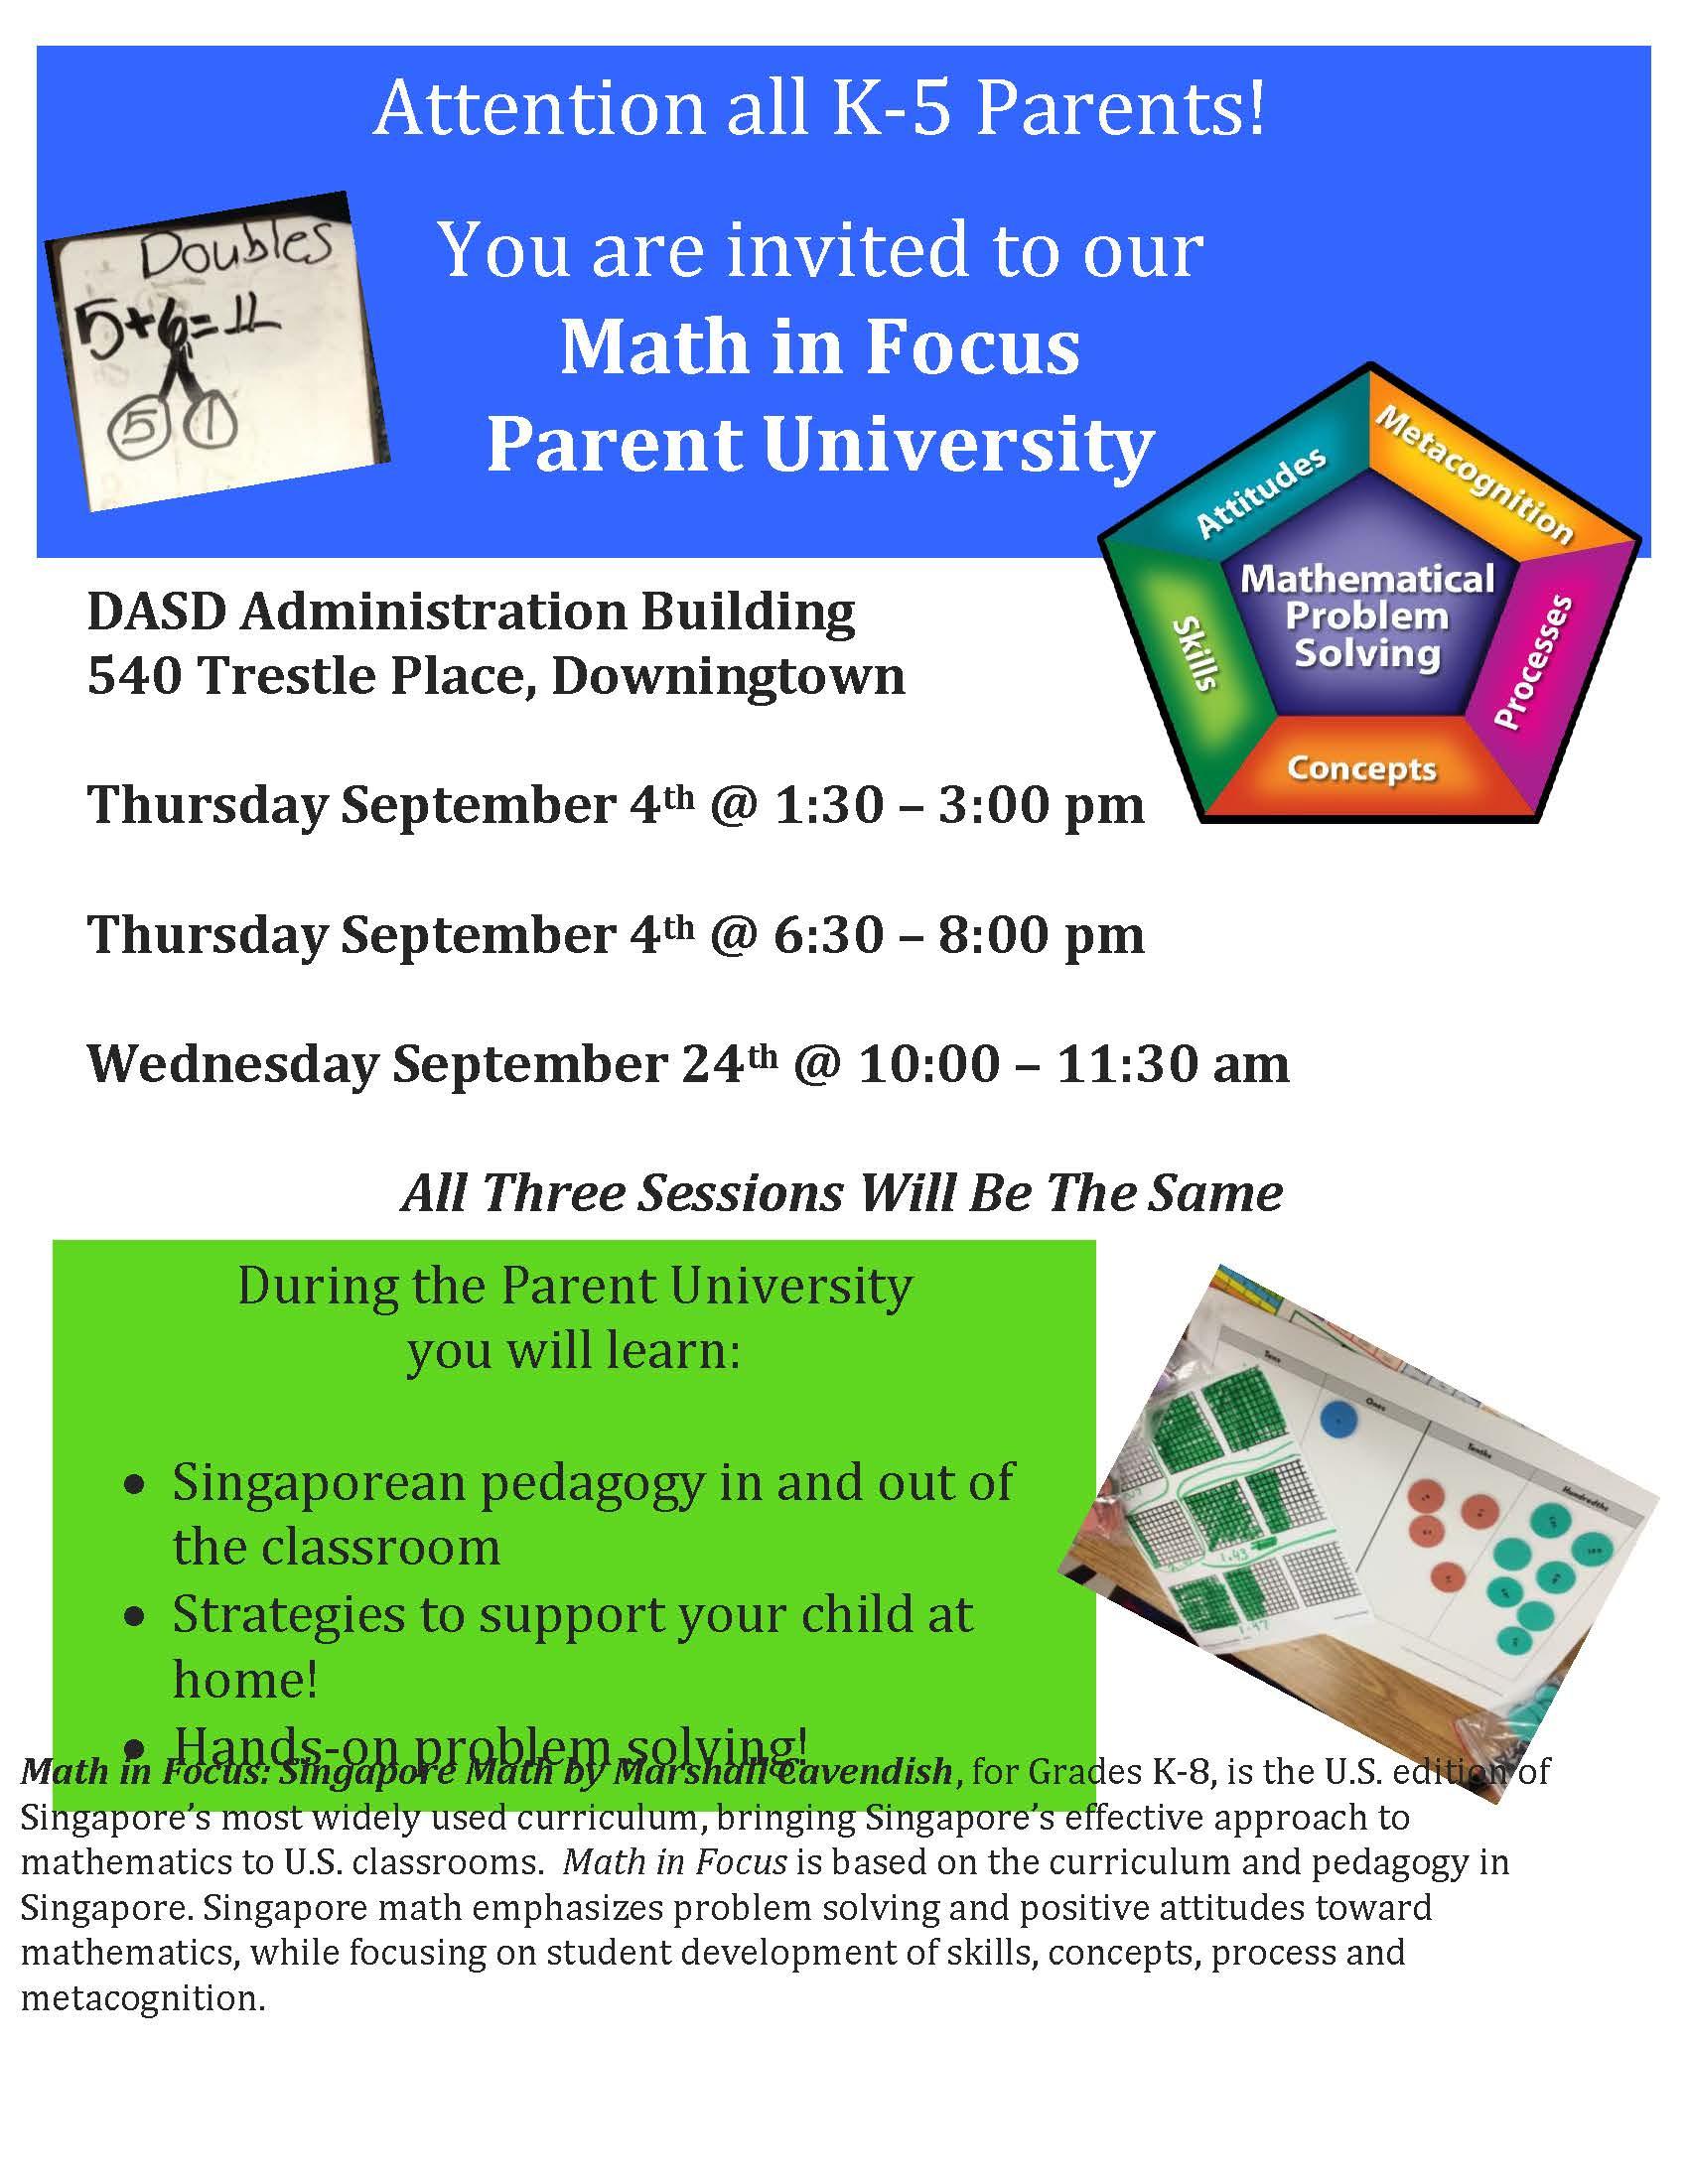 Save The Date Dasd Parent University Math In Focus